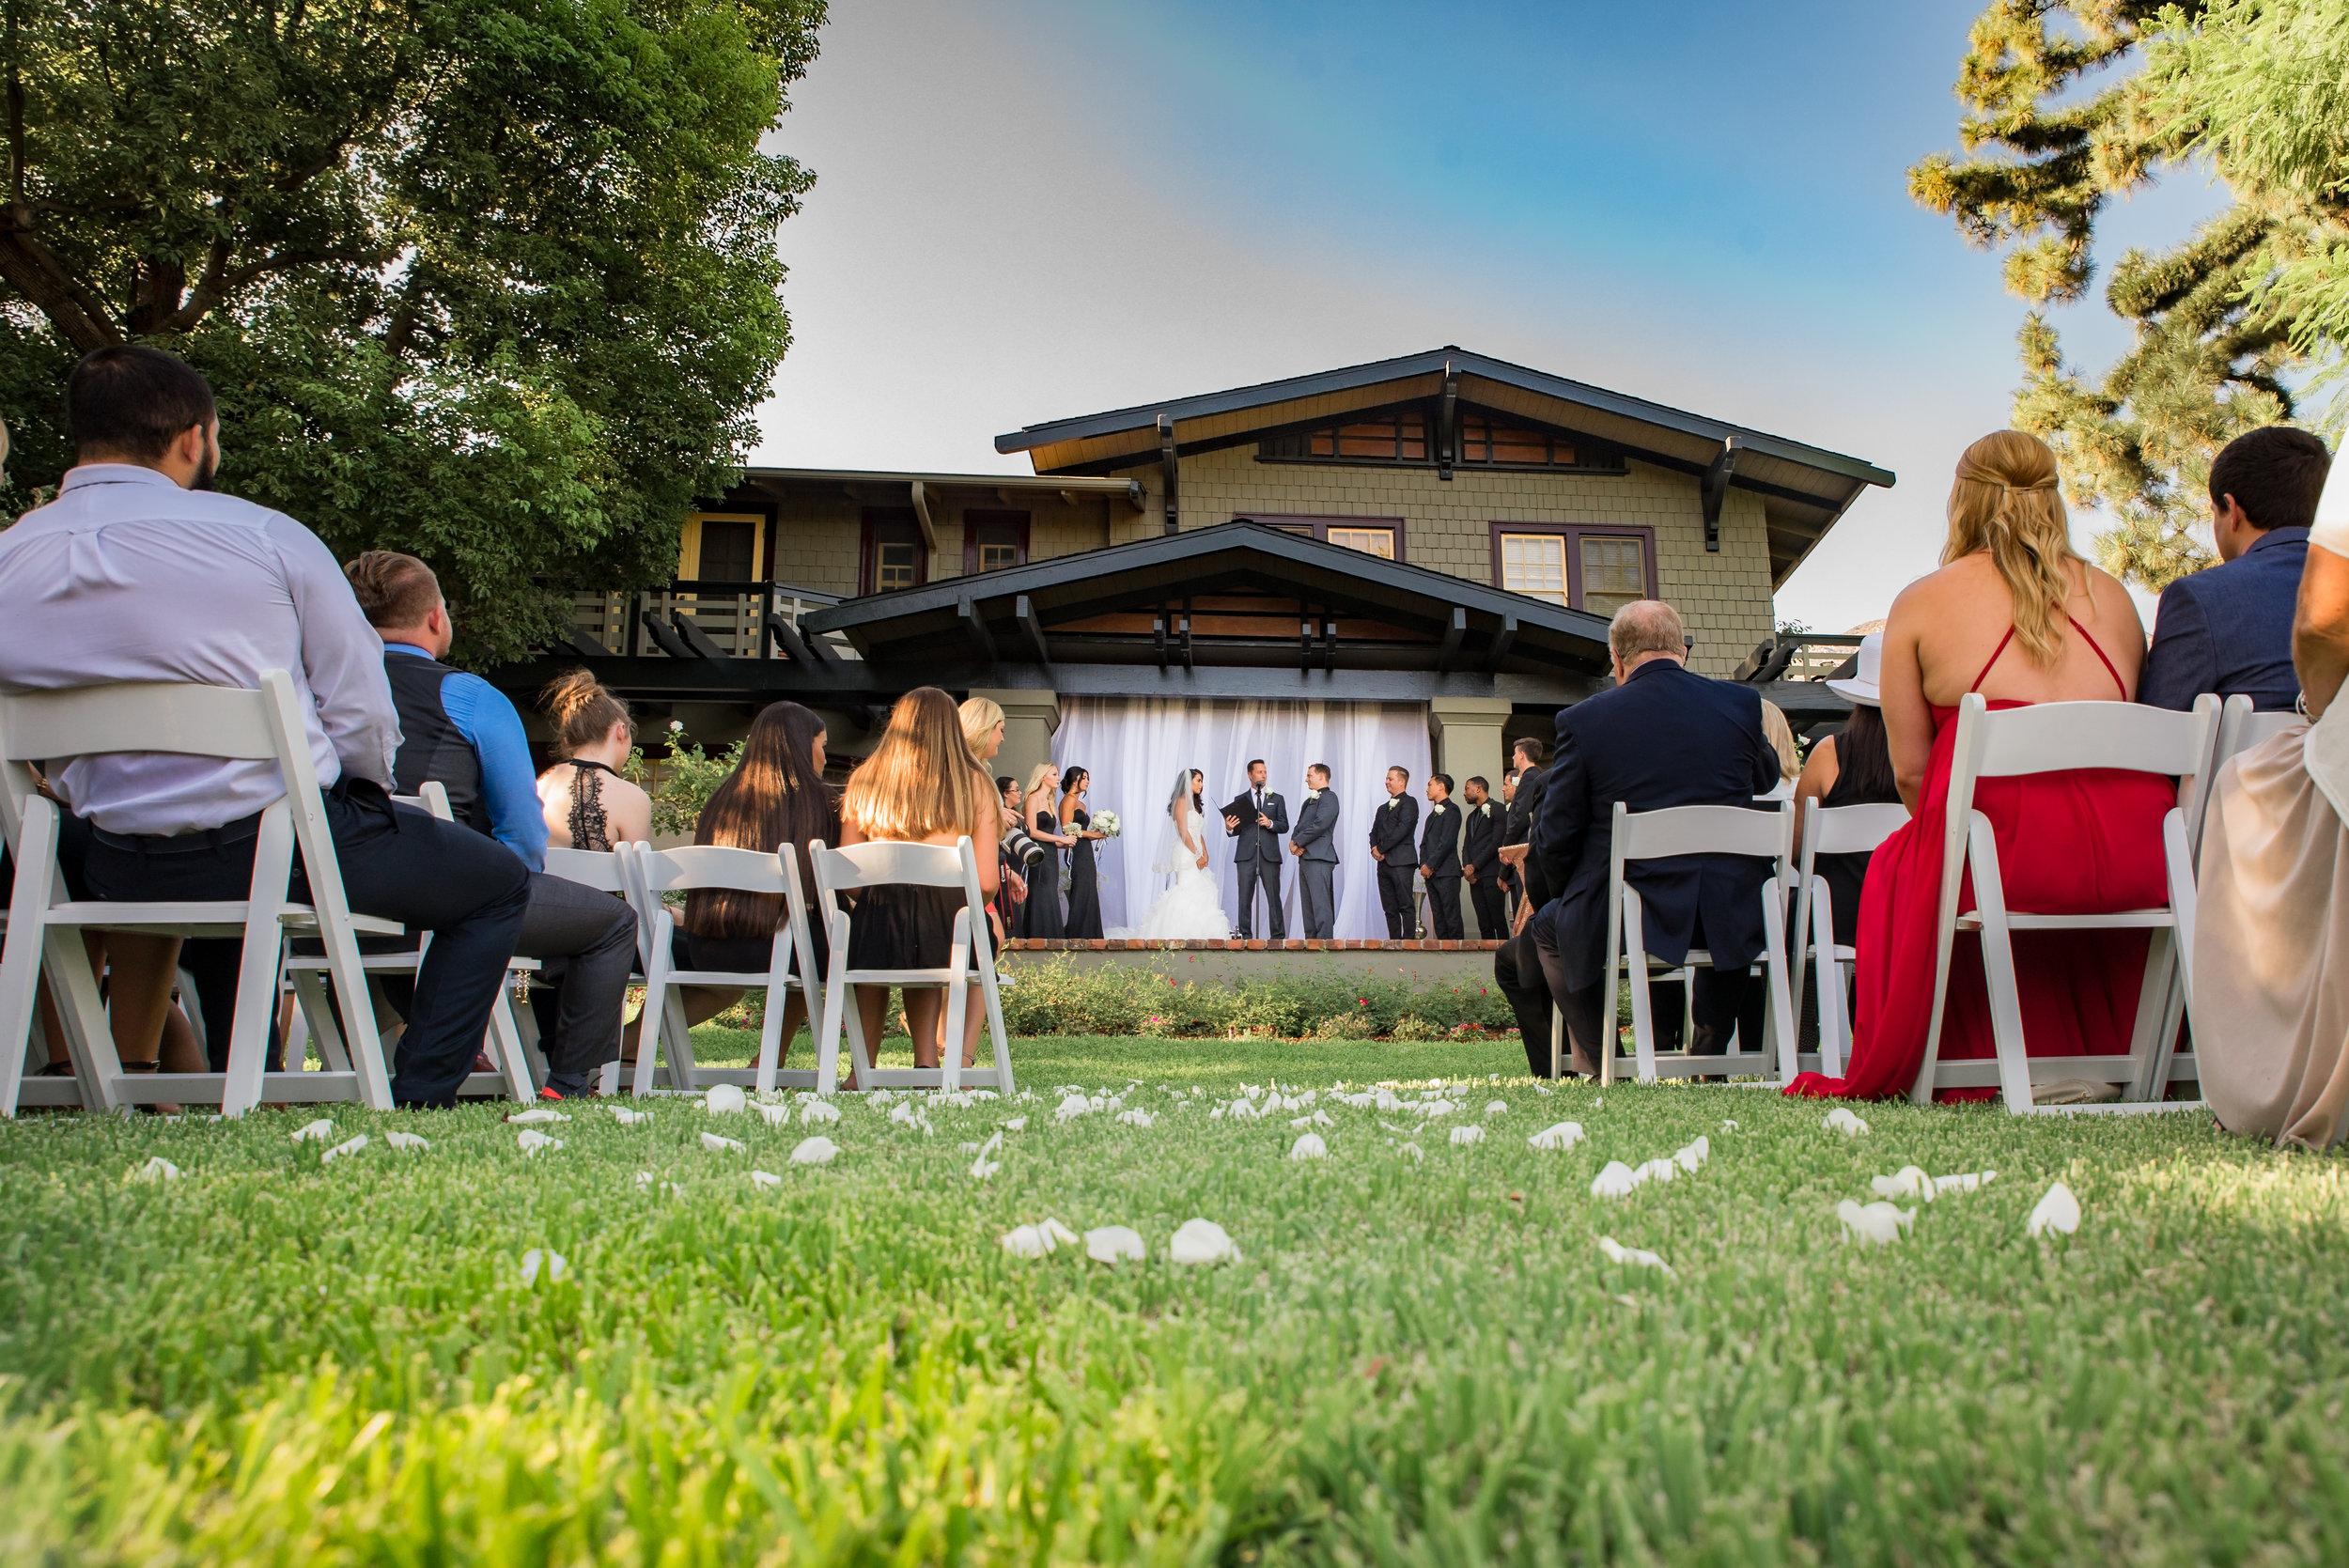 183_2016_August_13-Second_Shooter_Bridgette_Ambrose_Wedding-26230.jpg